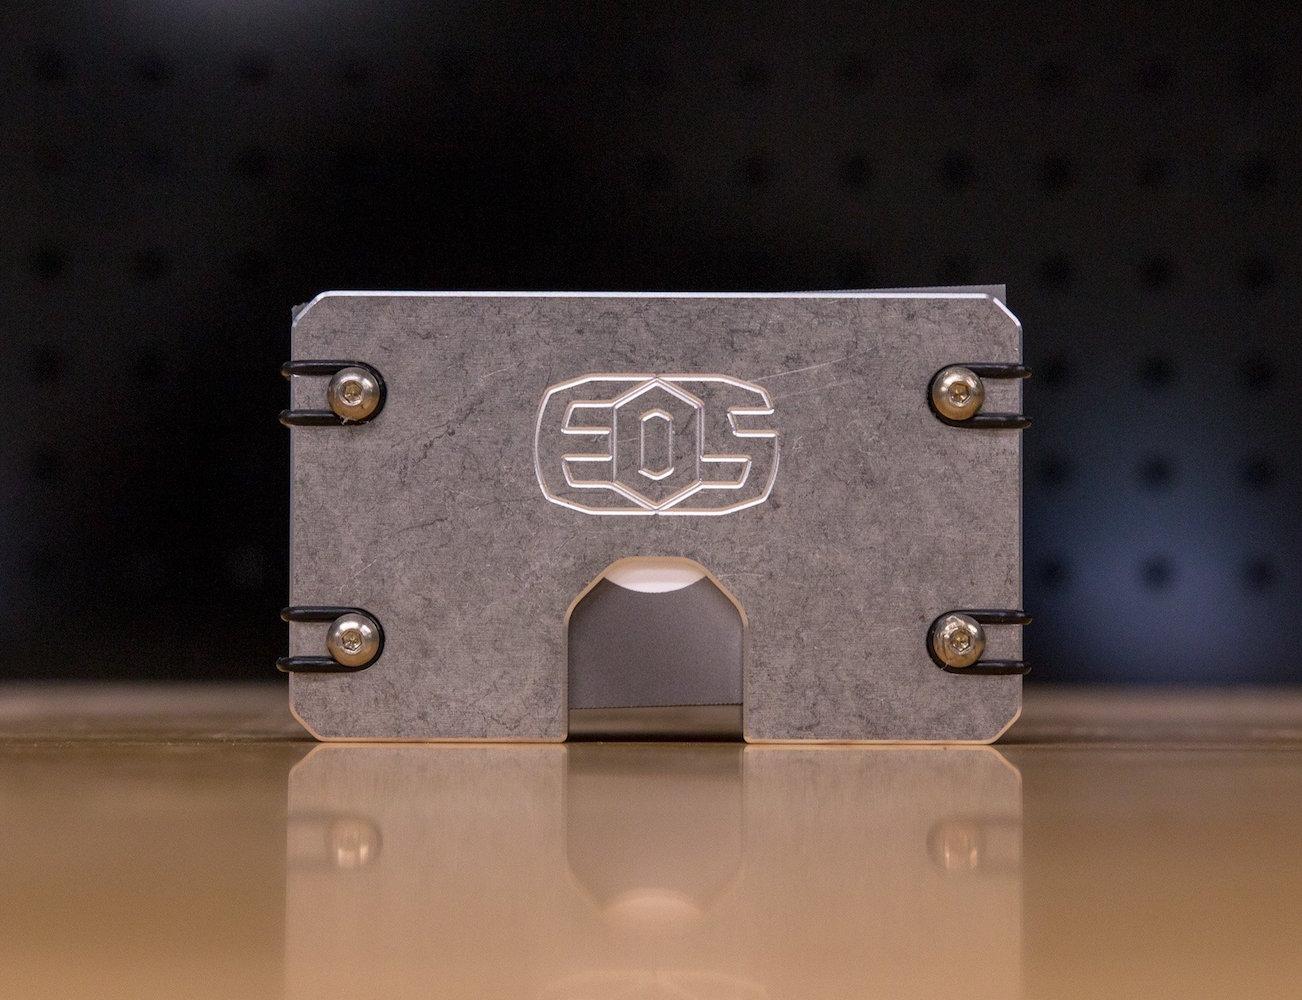 EOS Aluminum Wallet